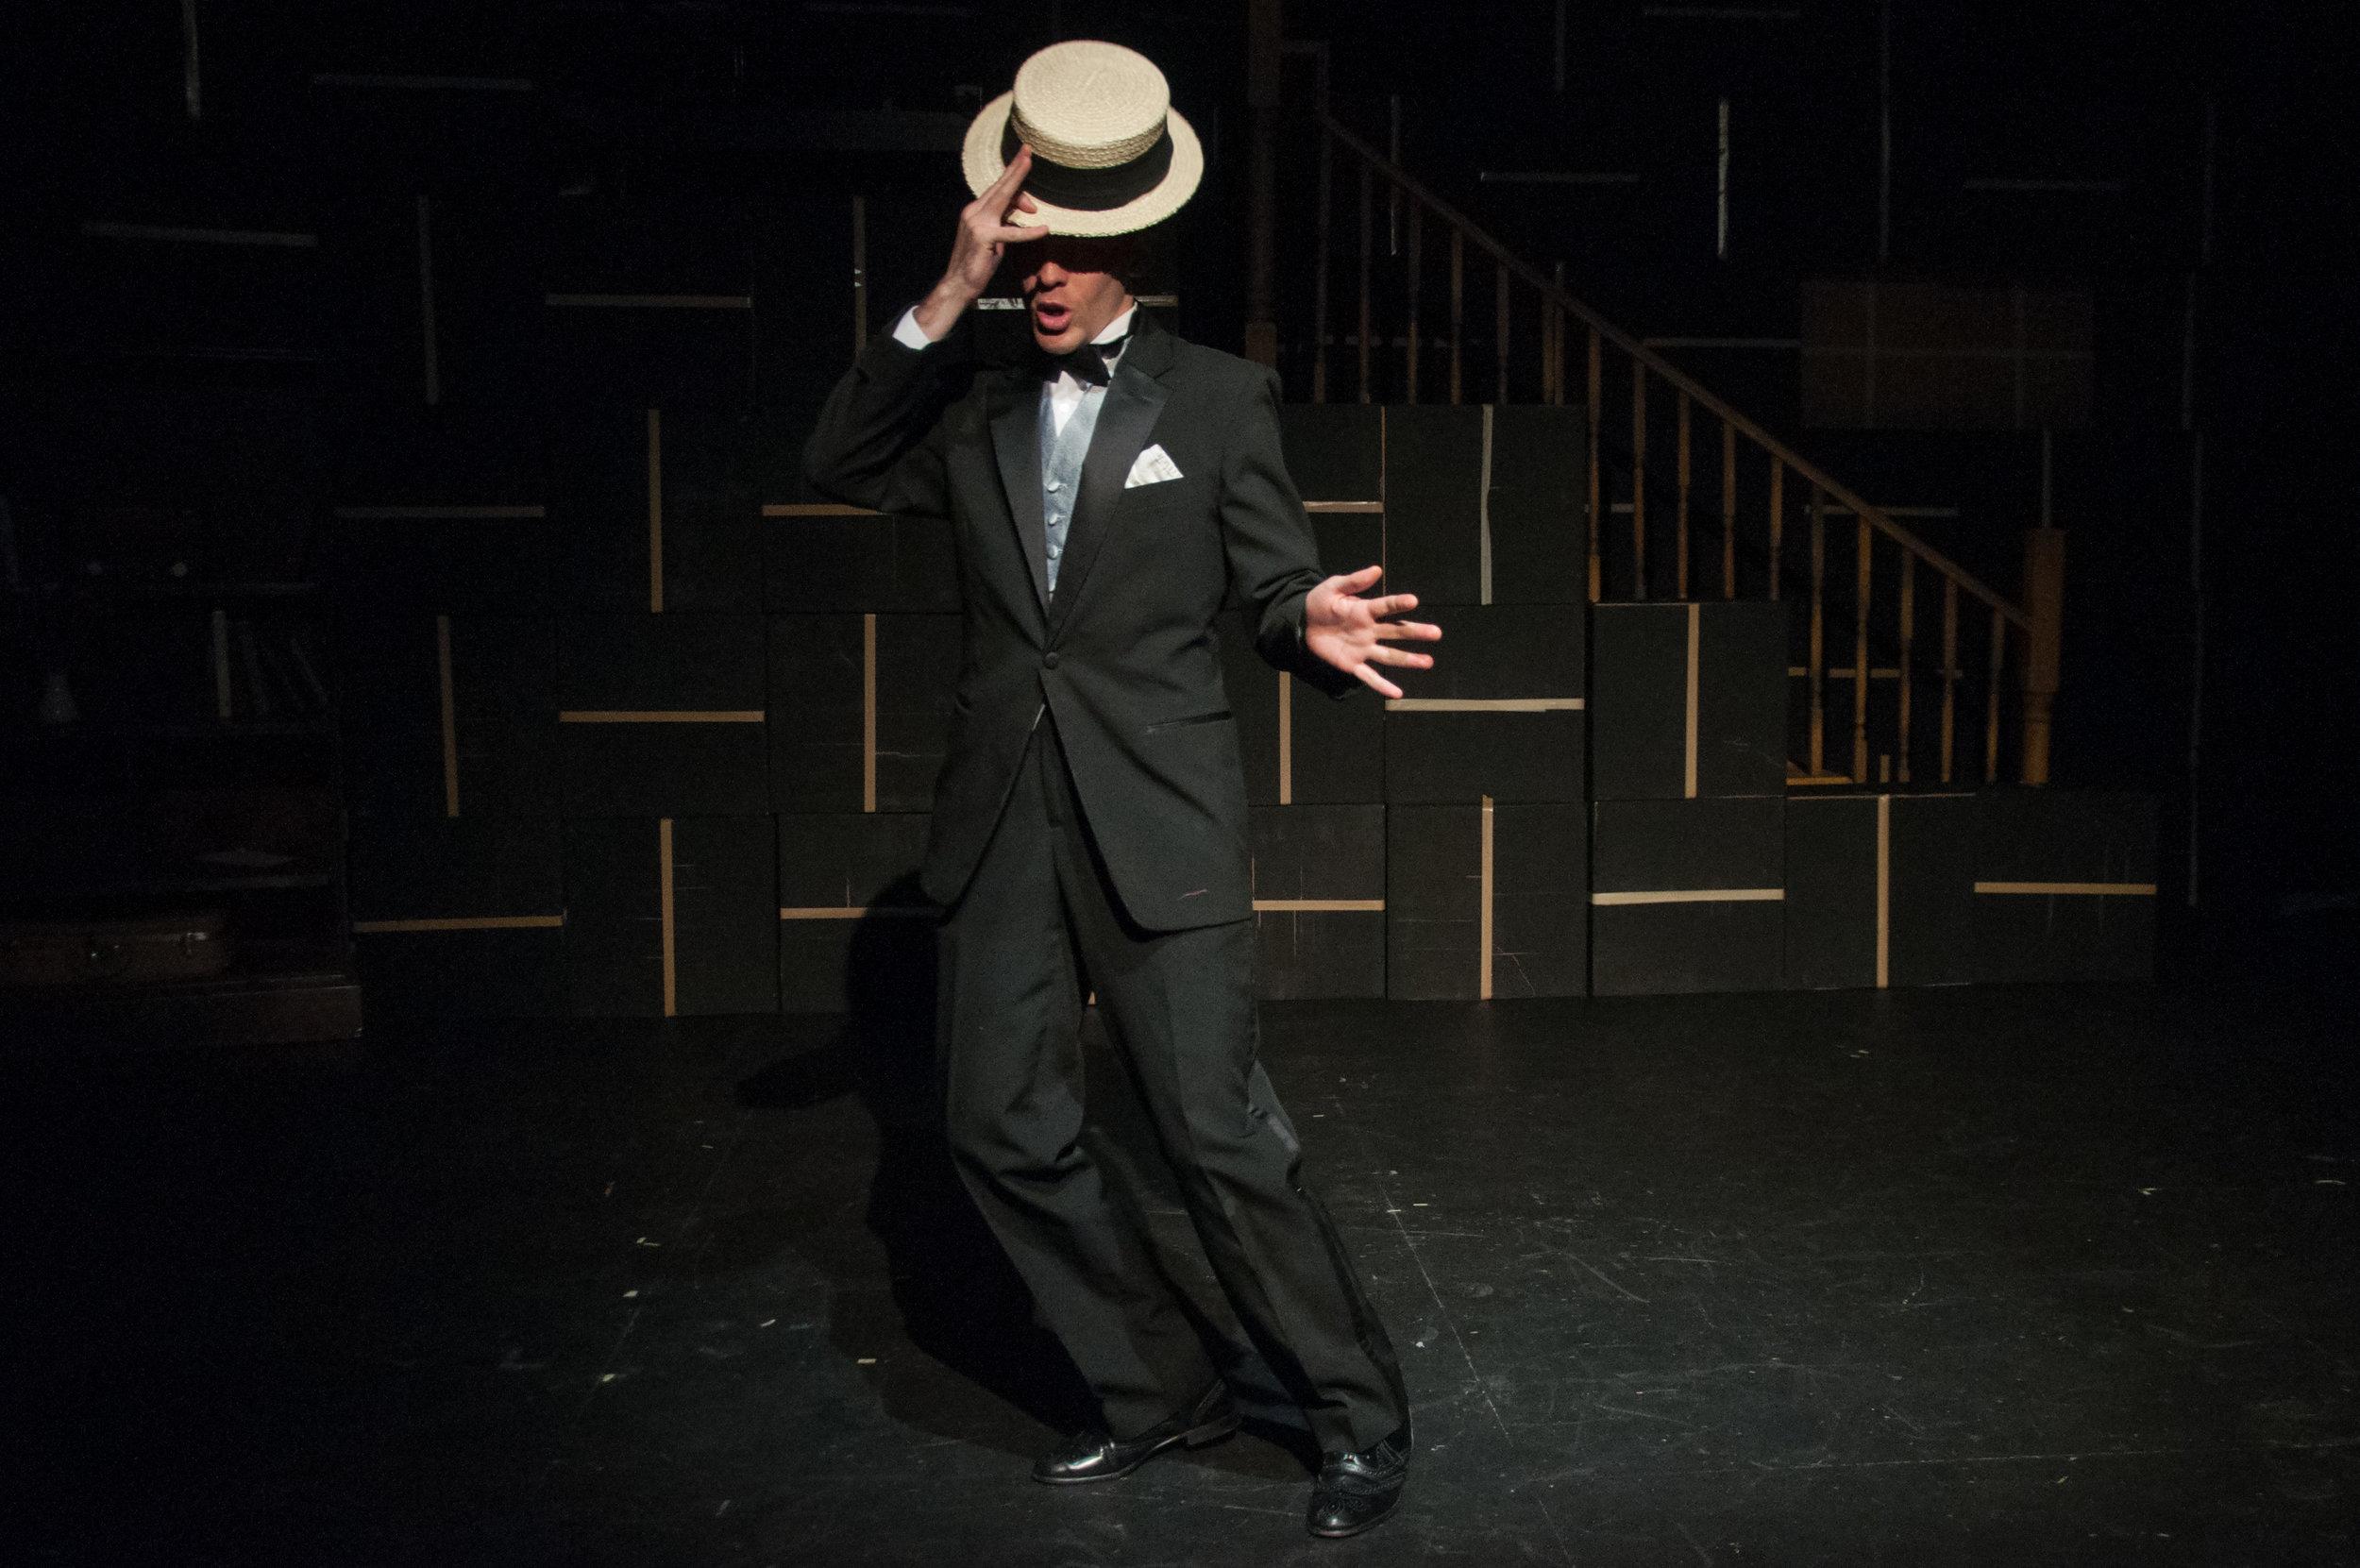 SELECTS 250 LEE STRASBERG StrasbergWorks I REMEMBER IT WELL Dress Rehearsal 7.22.15 PHOTO BY BAILEY CARR.jpg